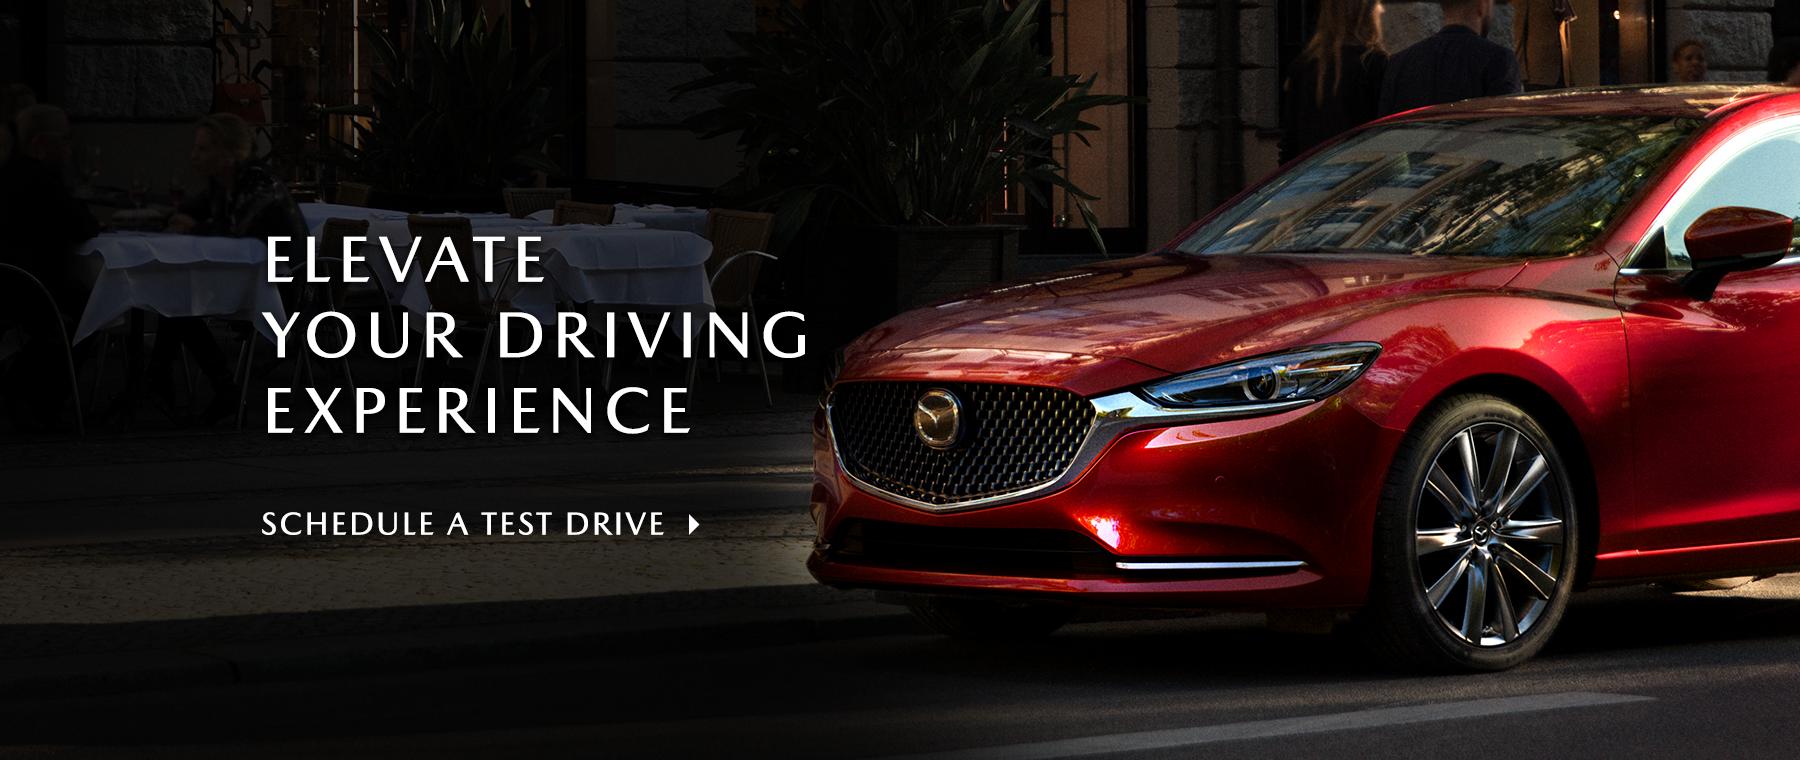 Mazda6 Brand Asse